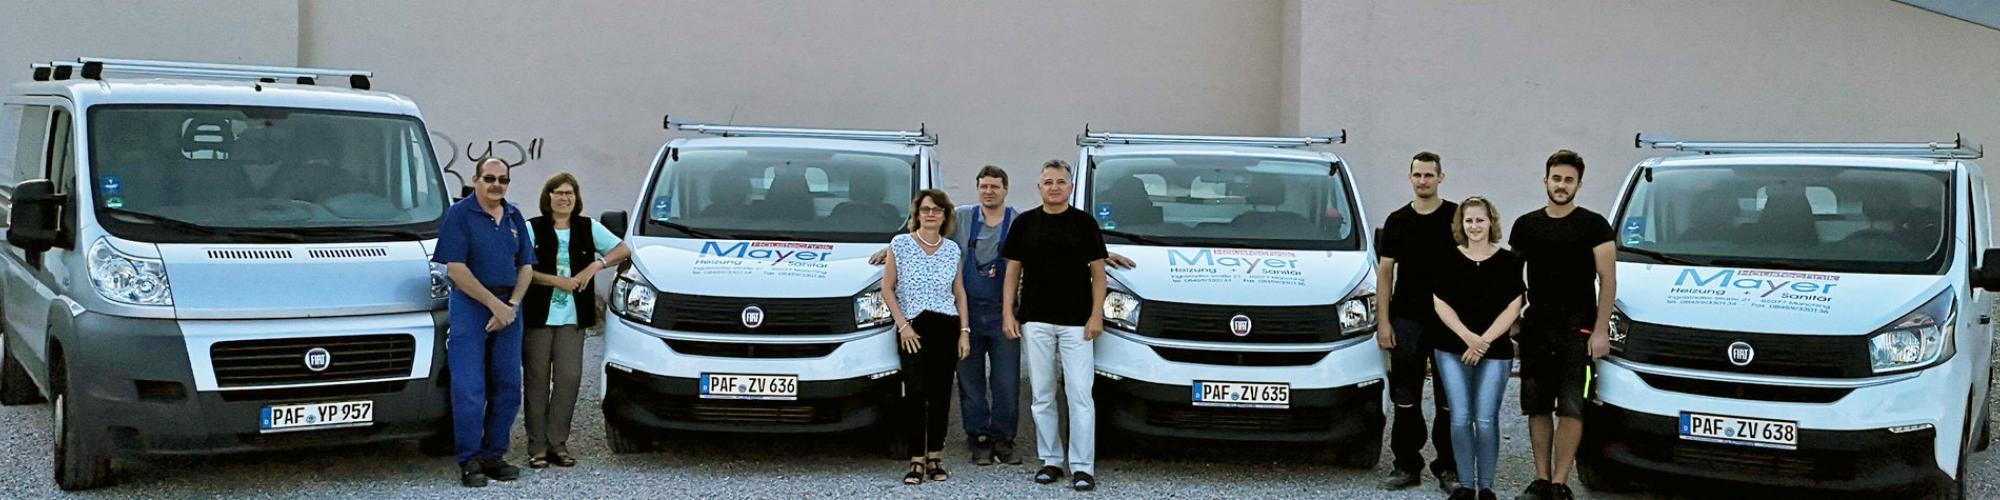 Heizung Mayer GmbH & Co.KG